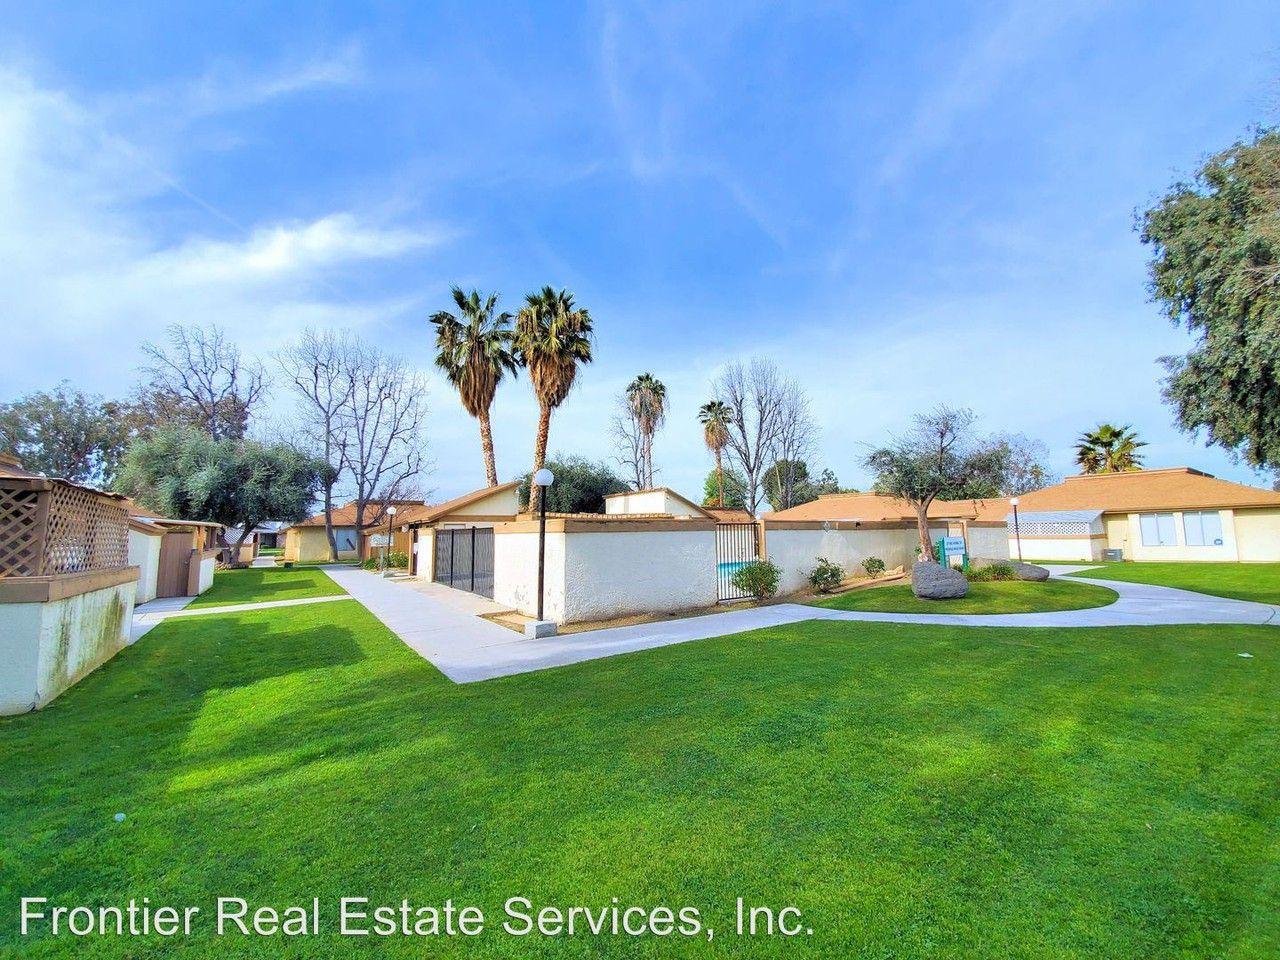 1001 Mcdonald Way #3, Bakersfield, CA 93309 2 Bedroom ...